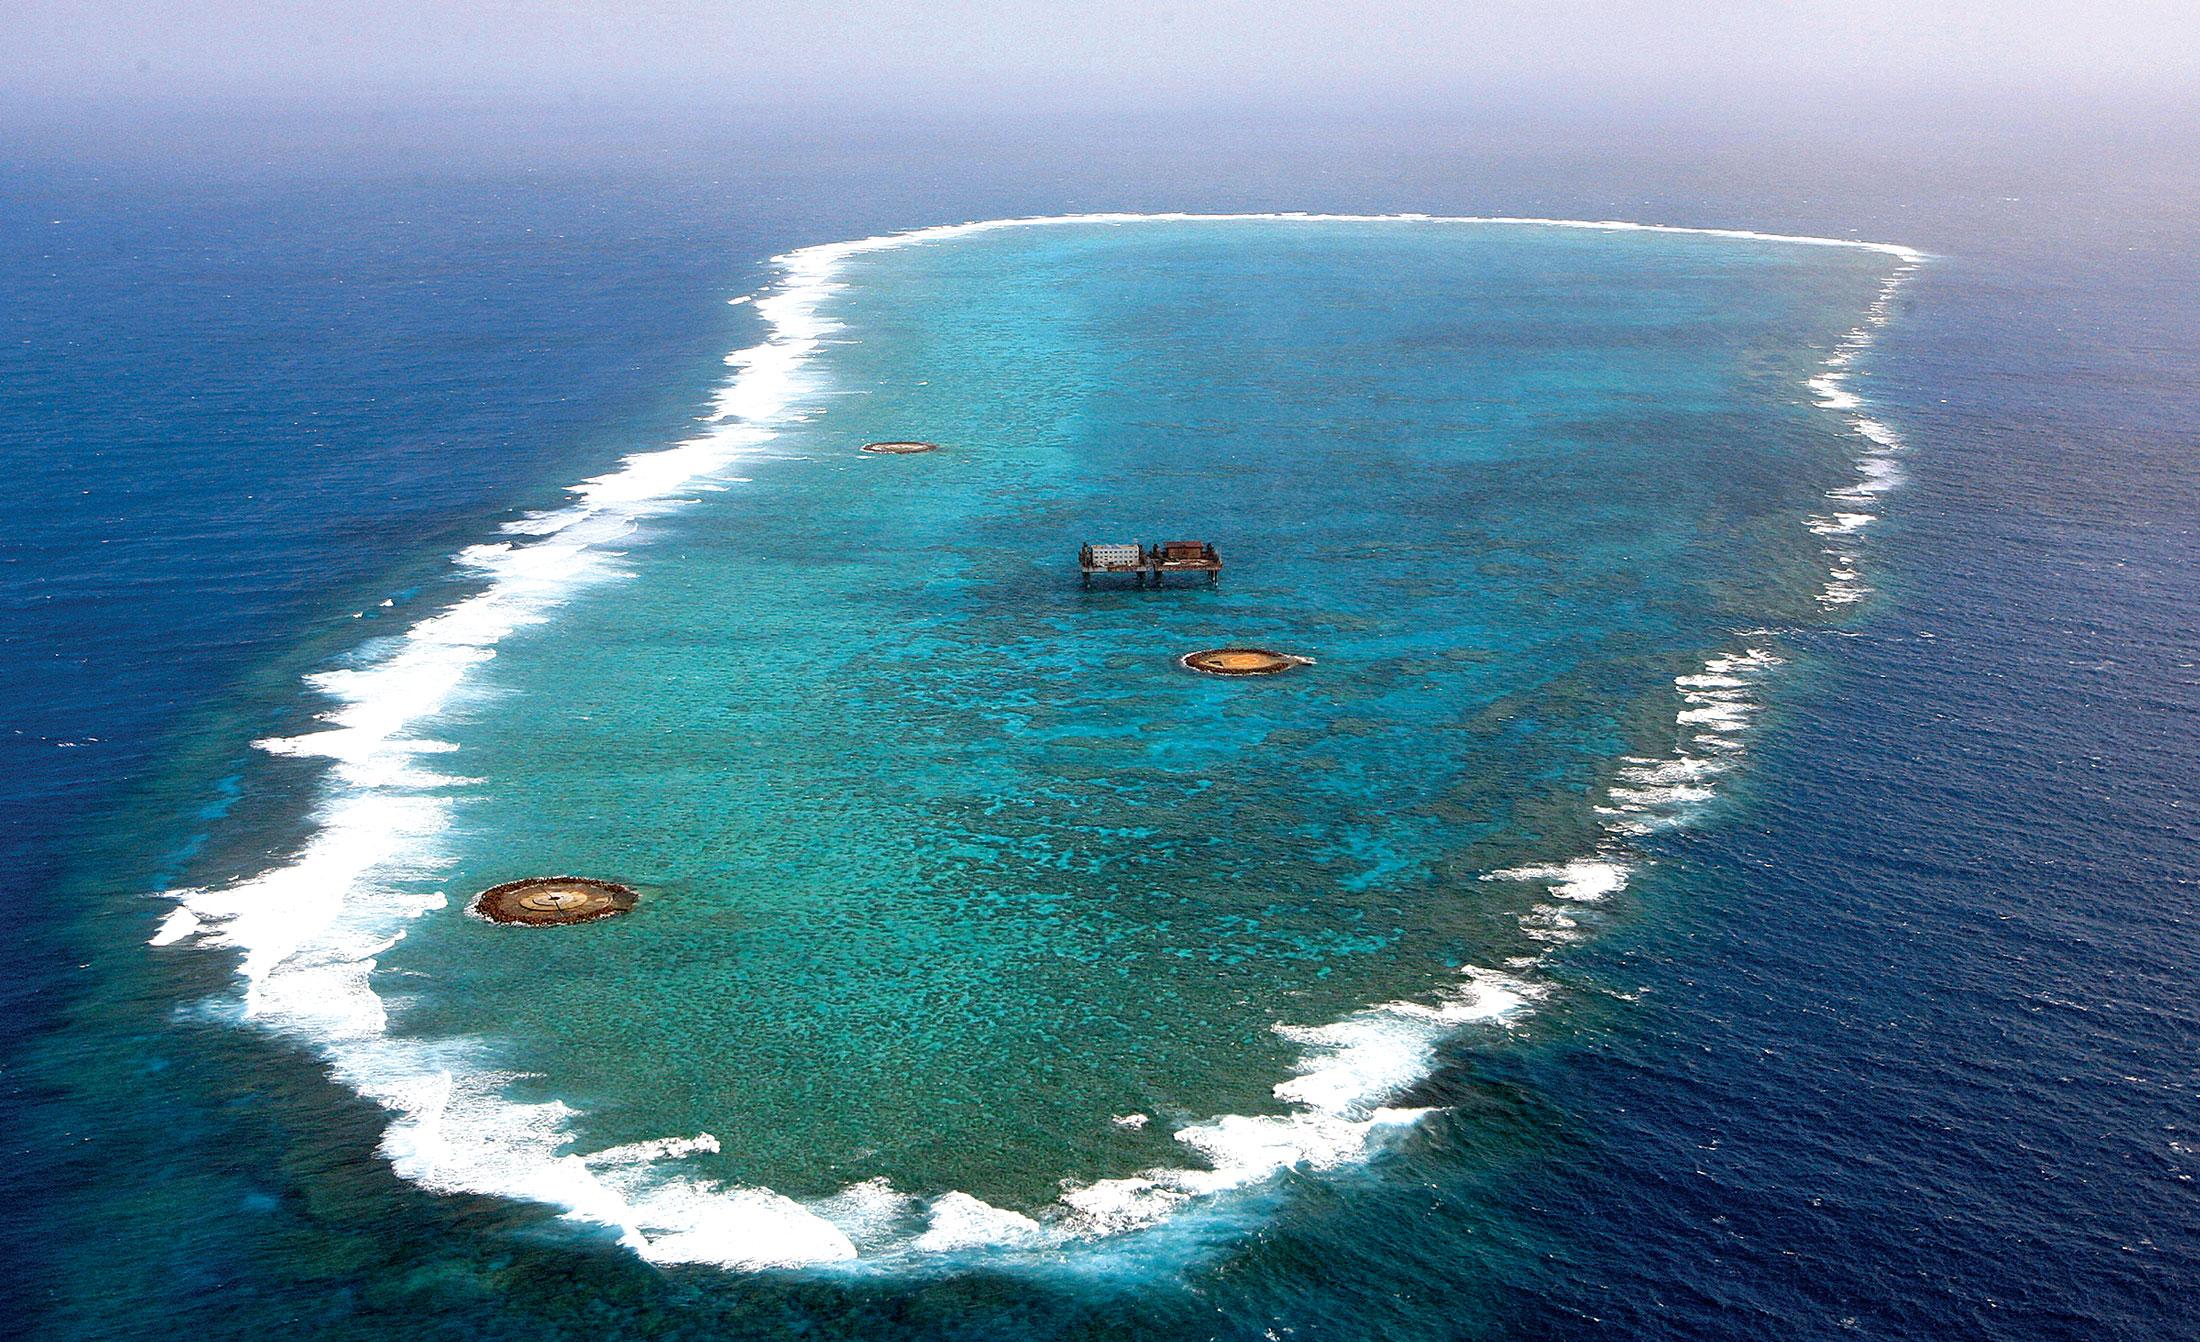 Okinotorishima is an island in Japan's economic zone.